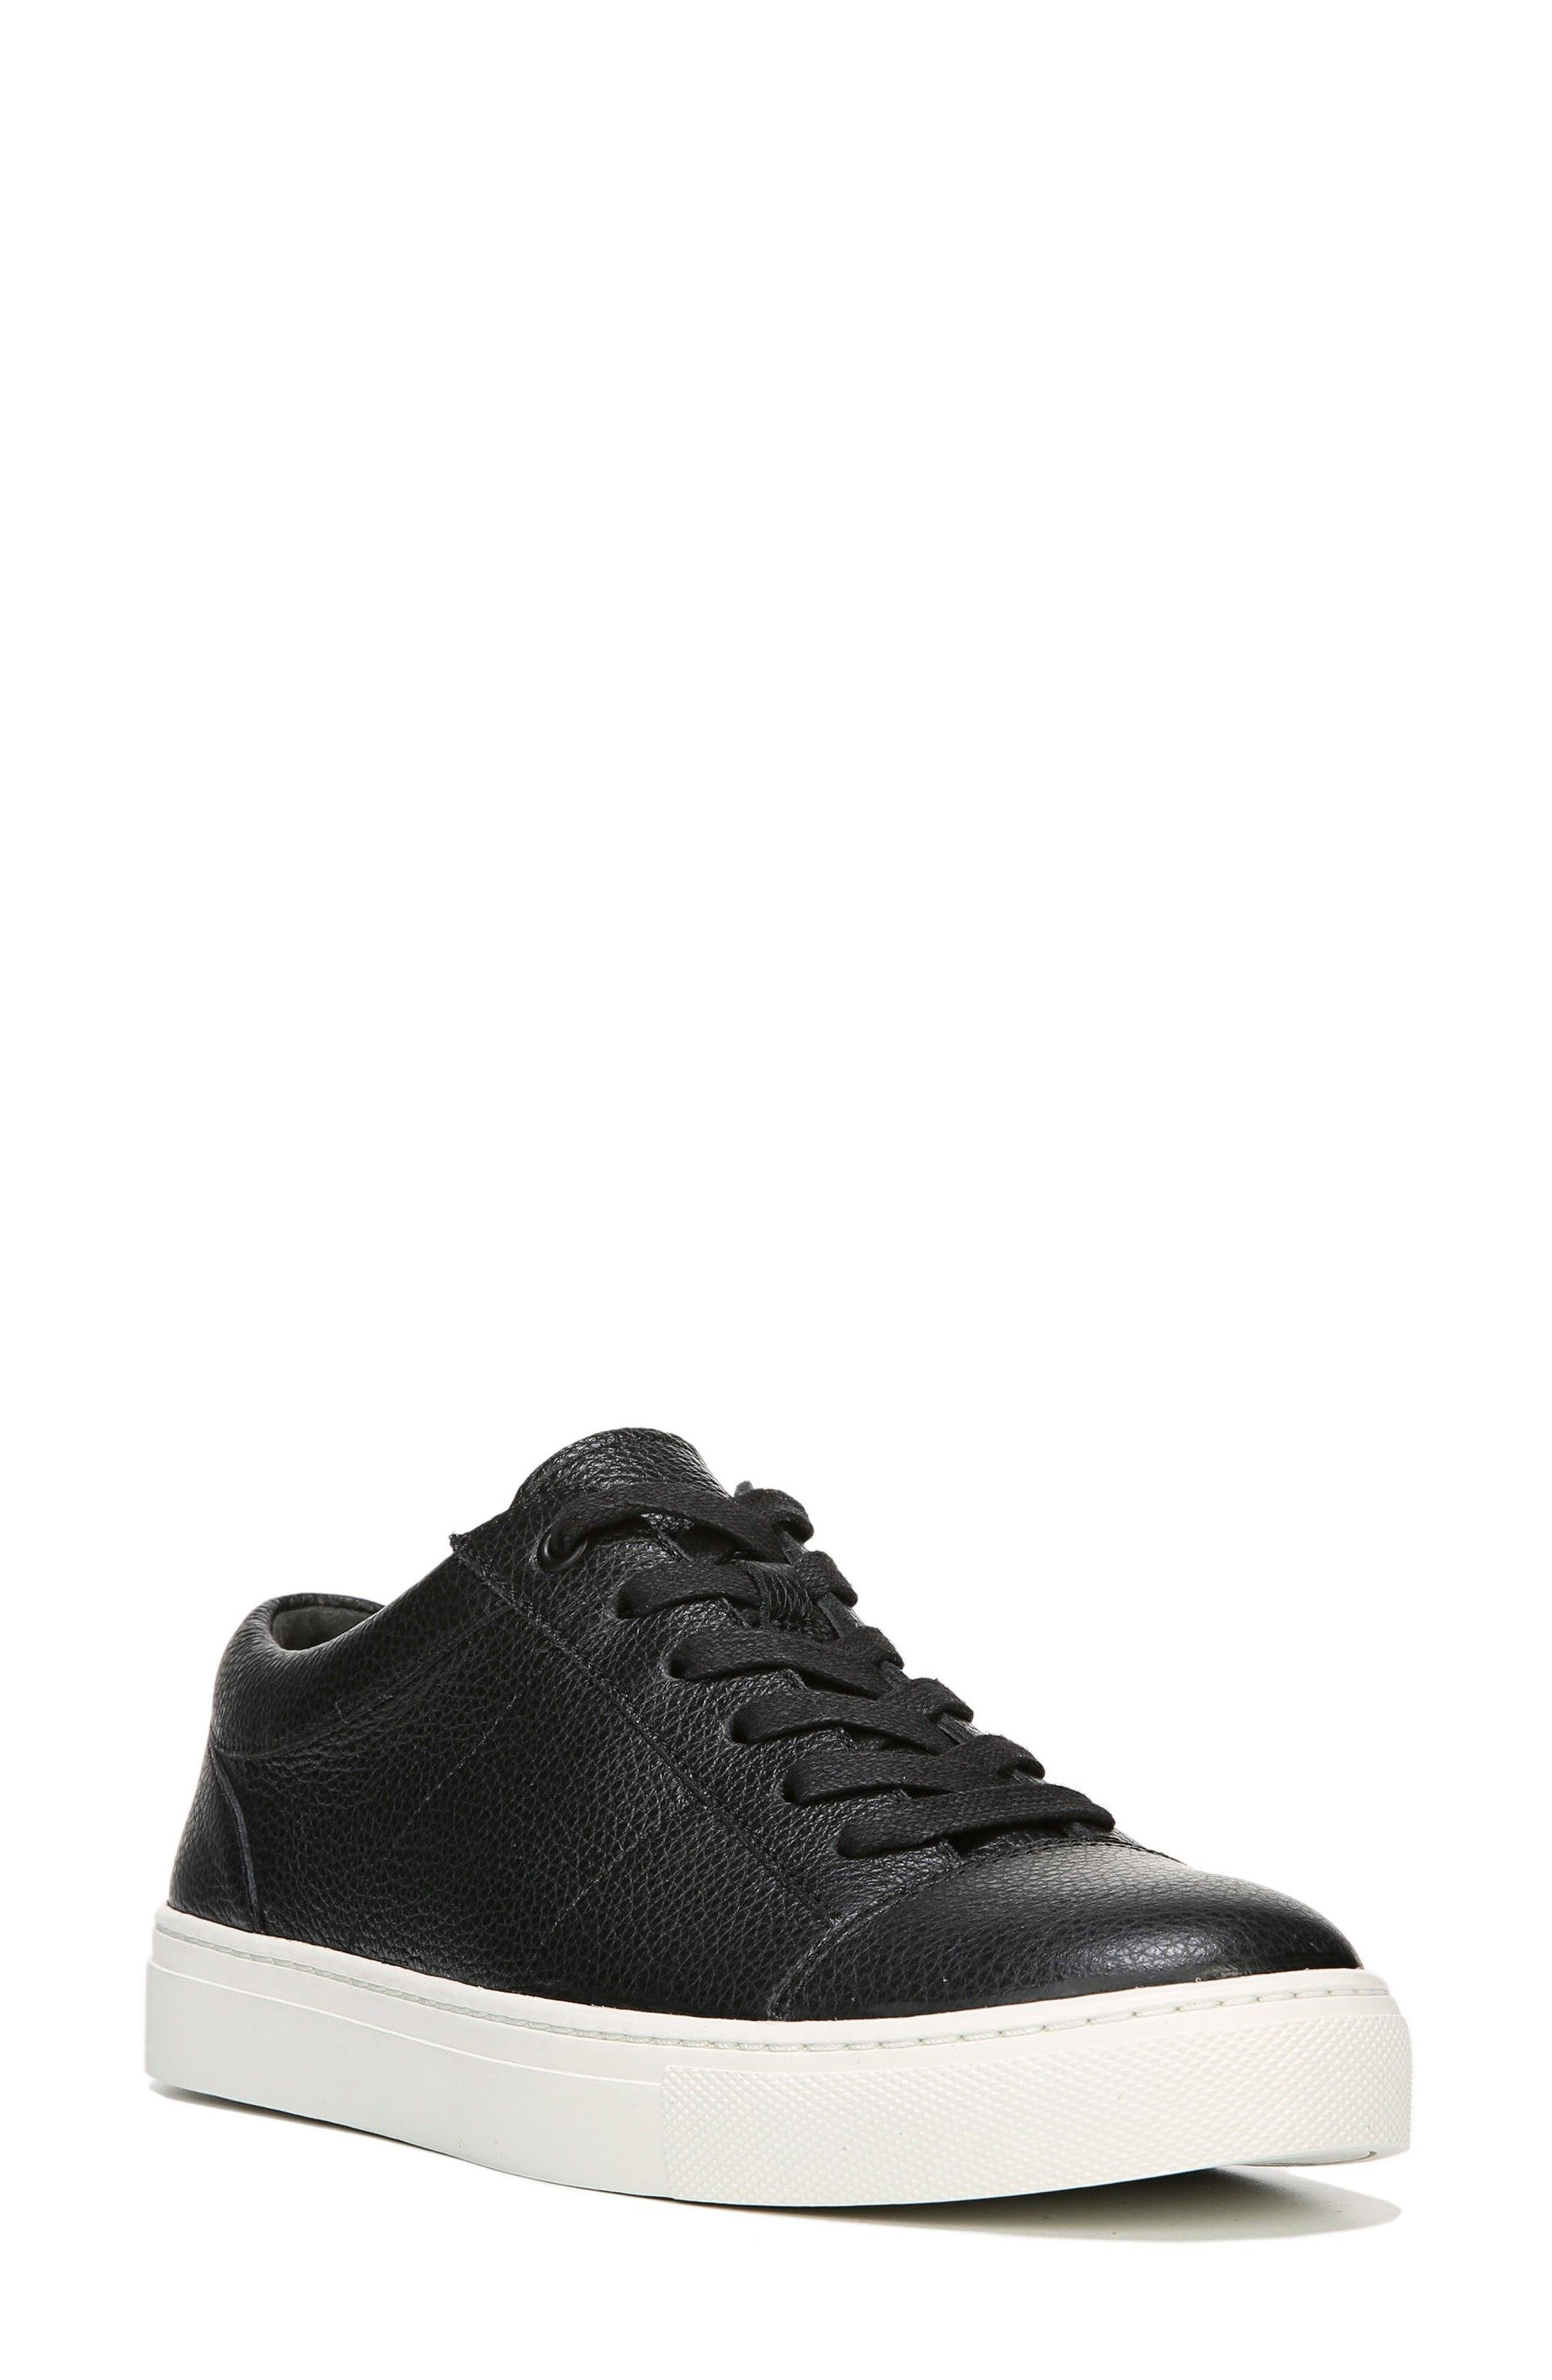 Afton Sneaker,                             Main thumbnail 1, color,                             001